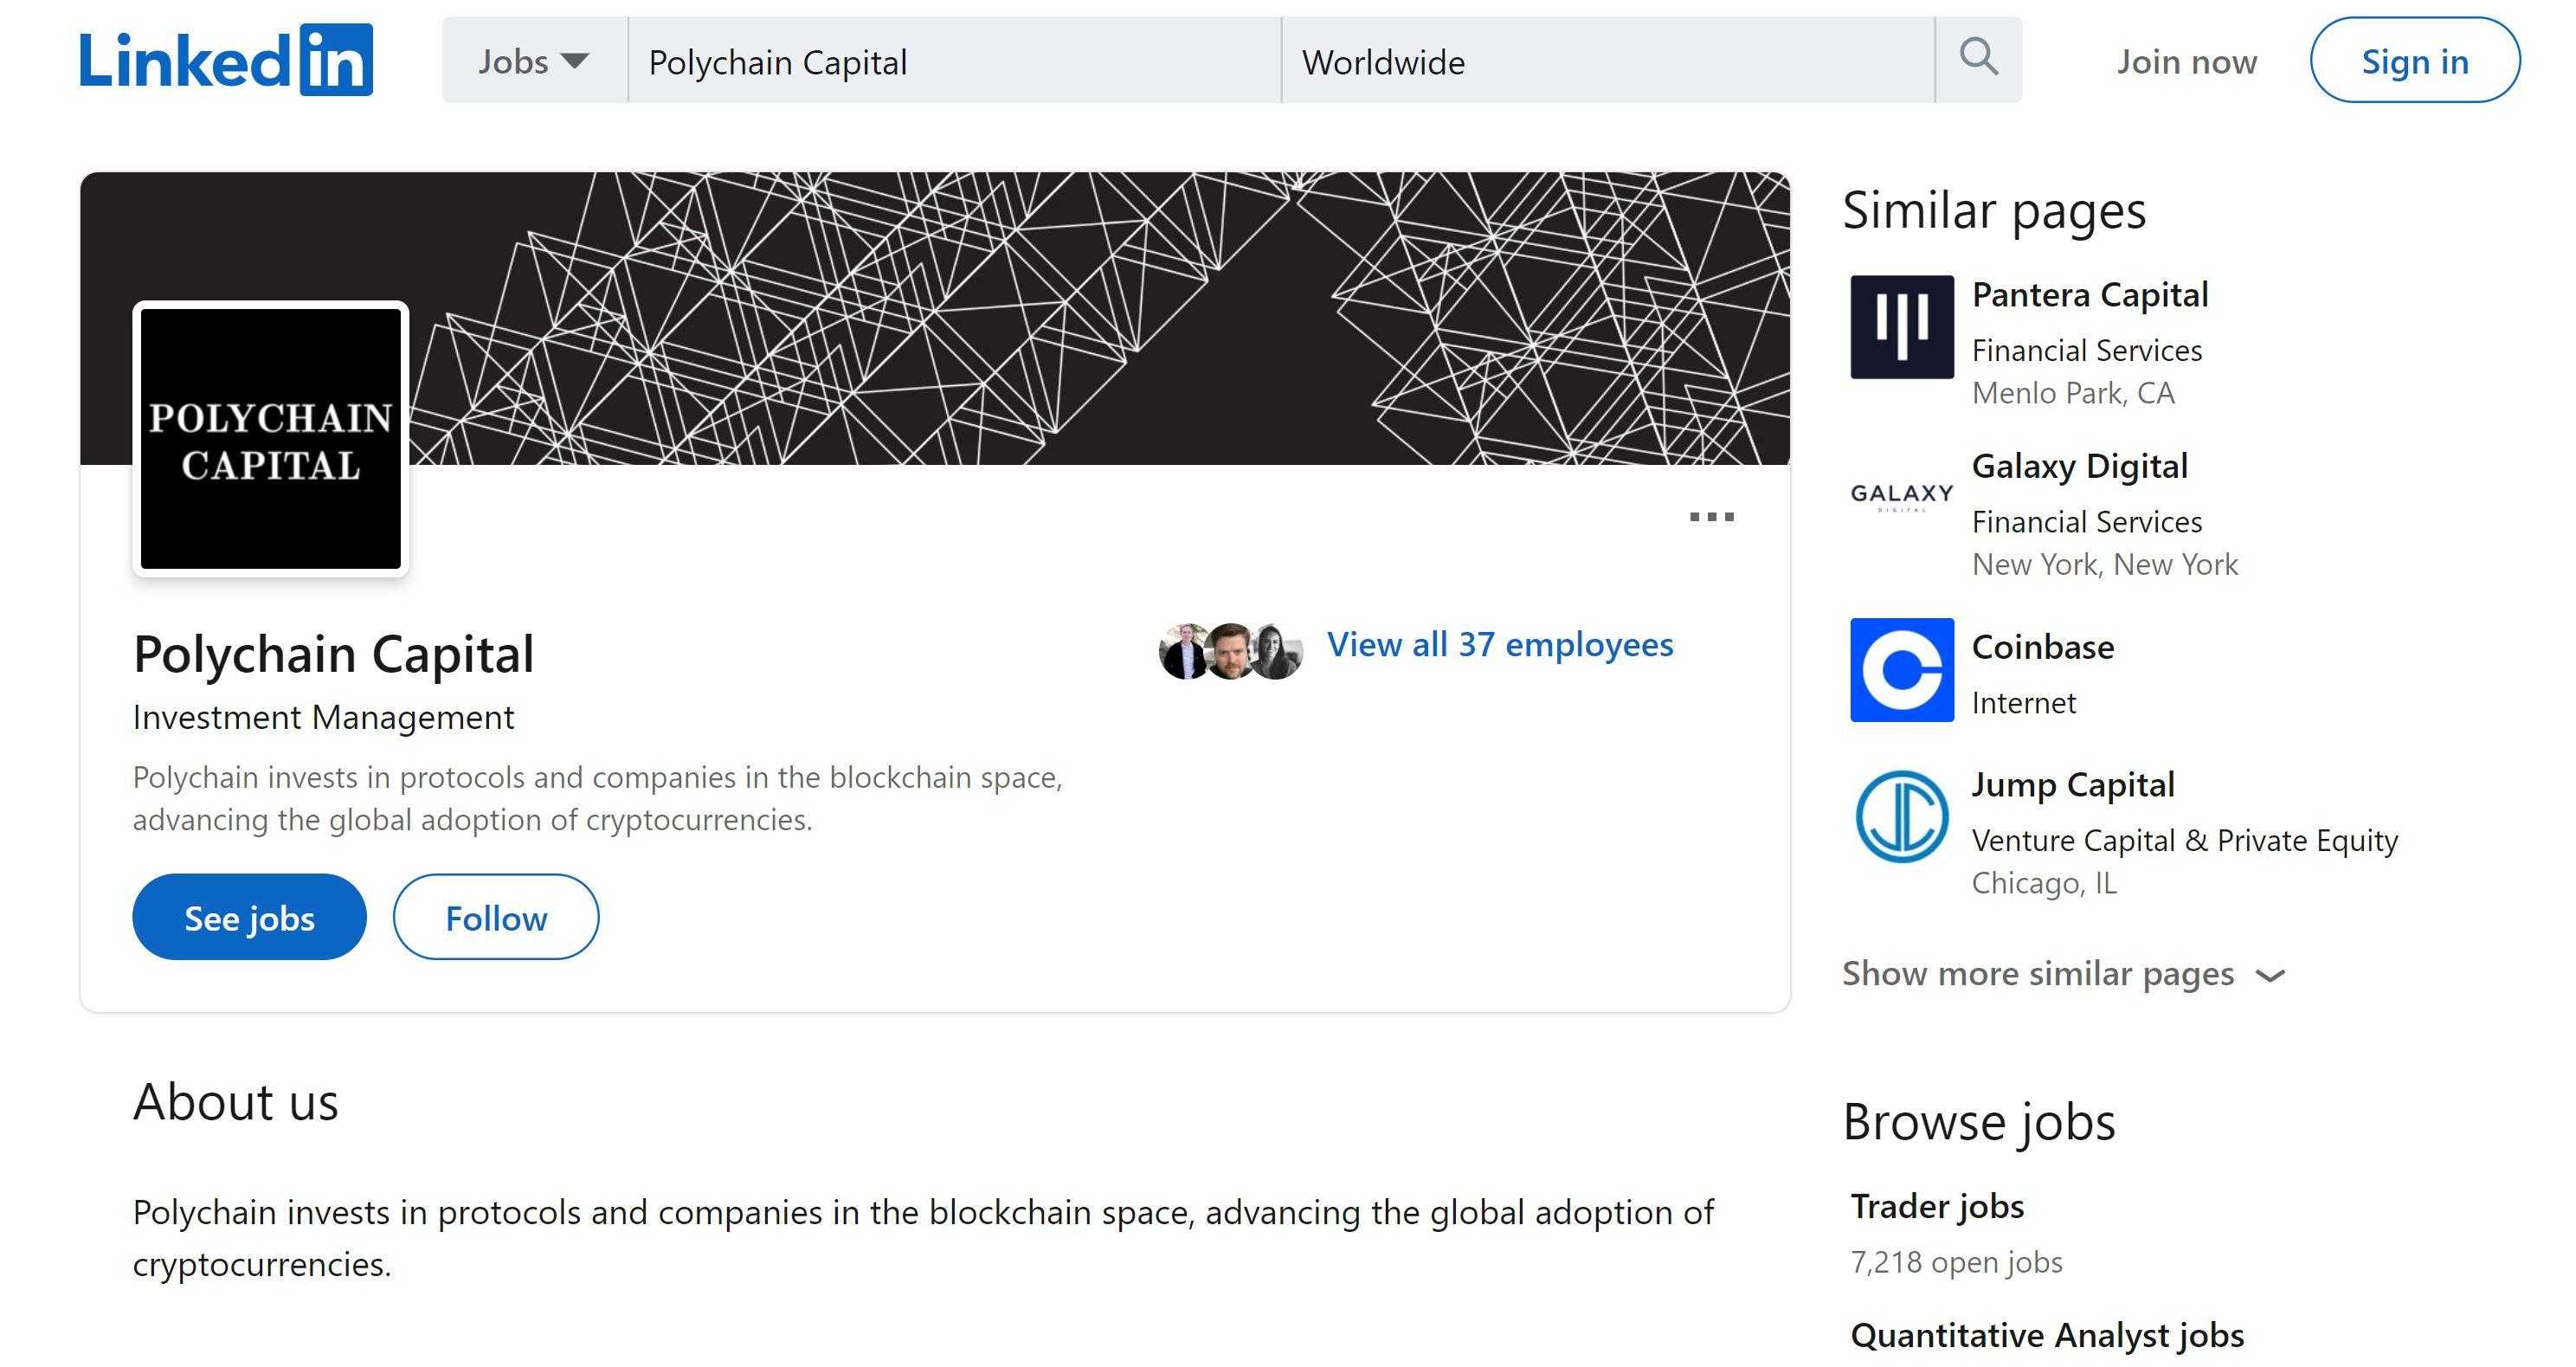 Polychain Capital LinkedIn